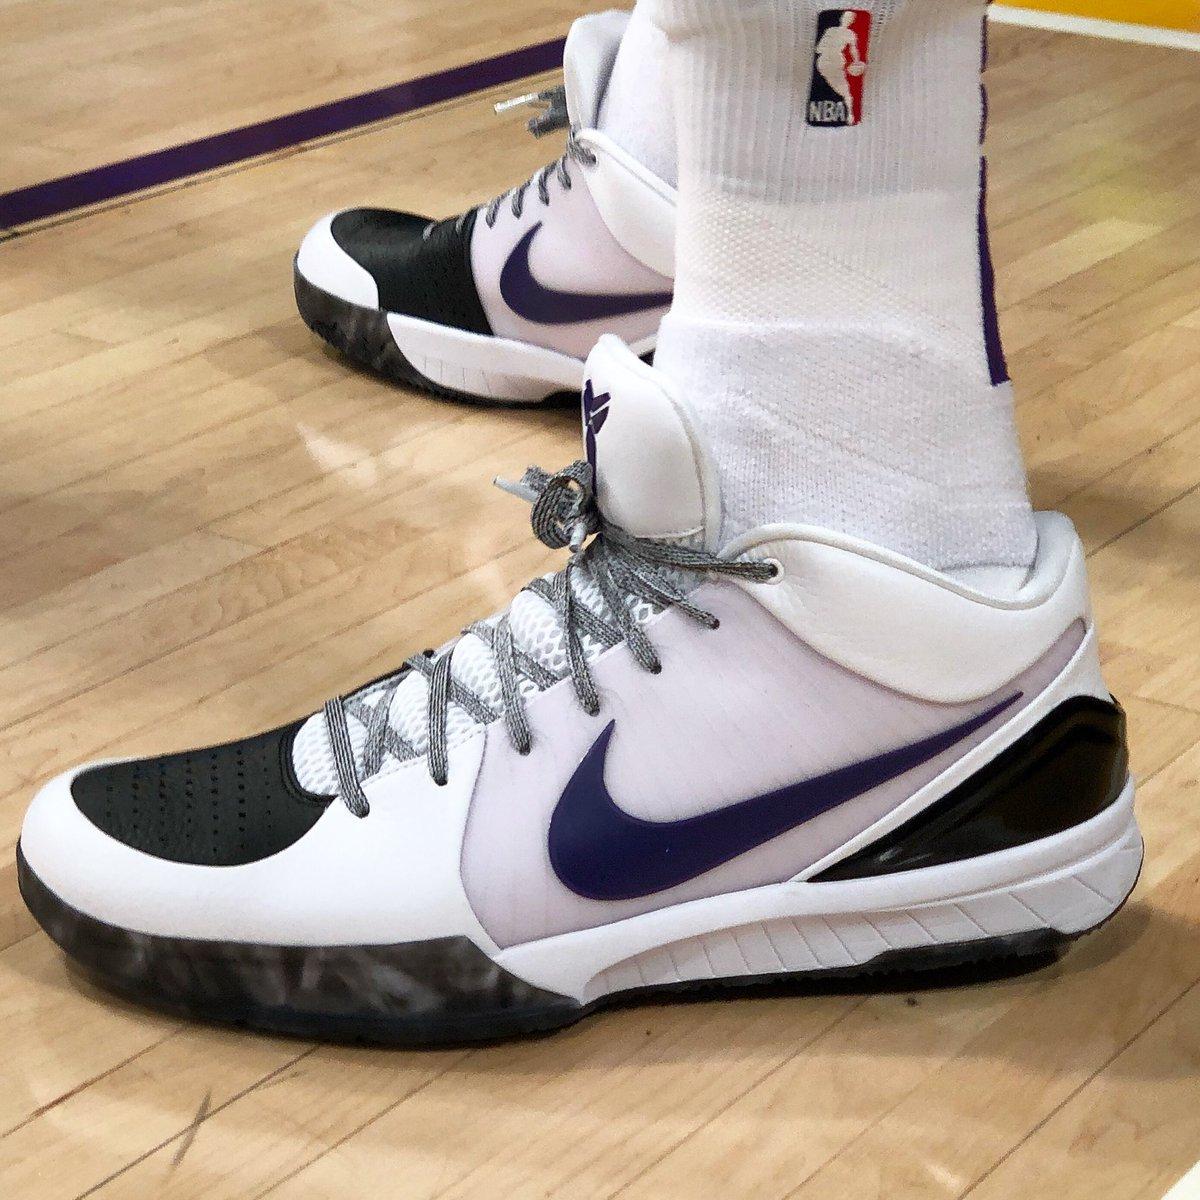 Kyle Kuzma's Nike Kobe 4 Protro P.E. tonight! #NBAKicks